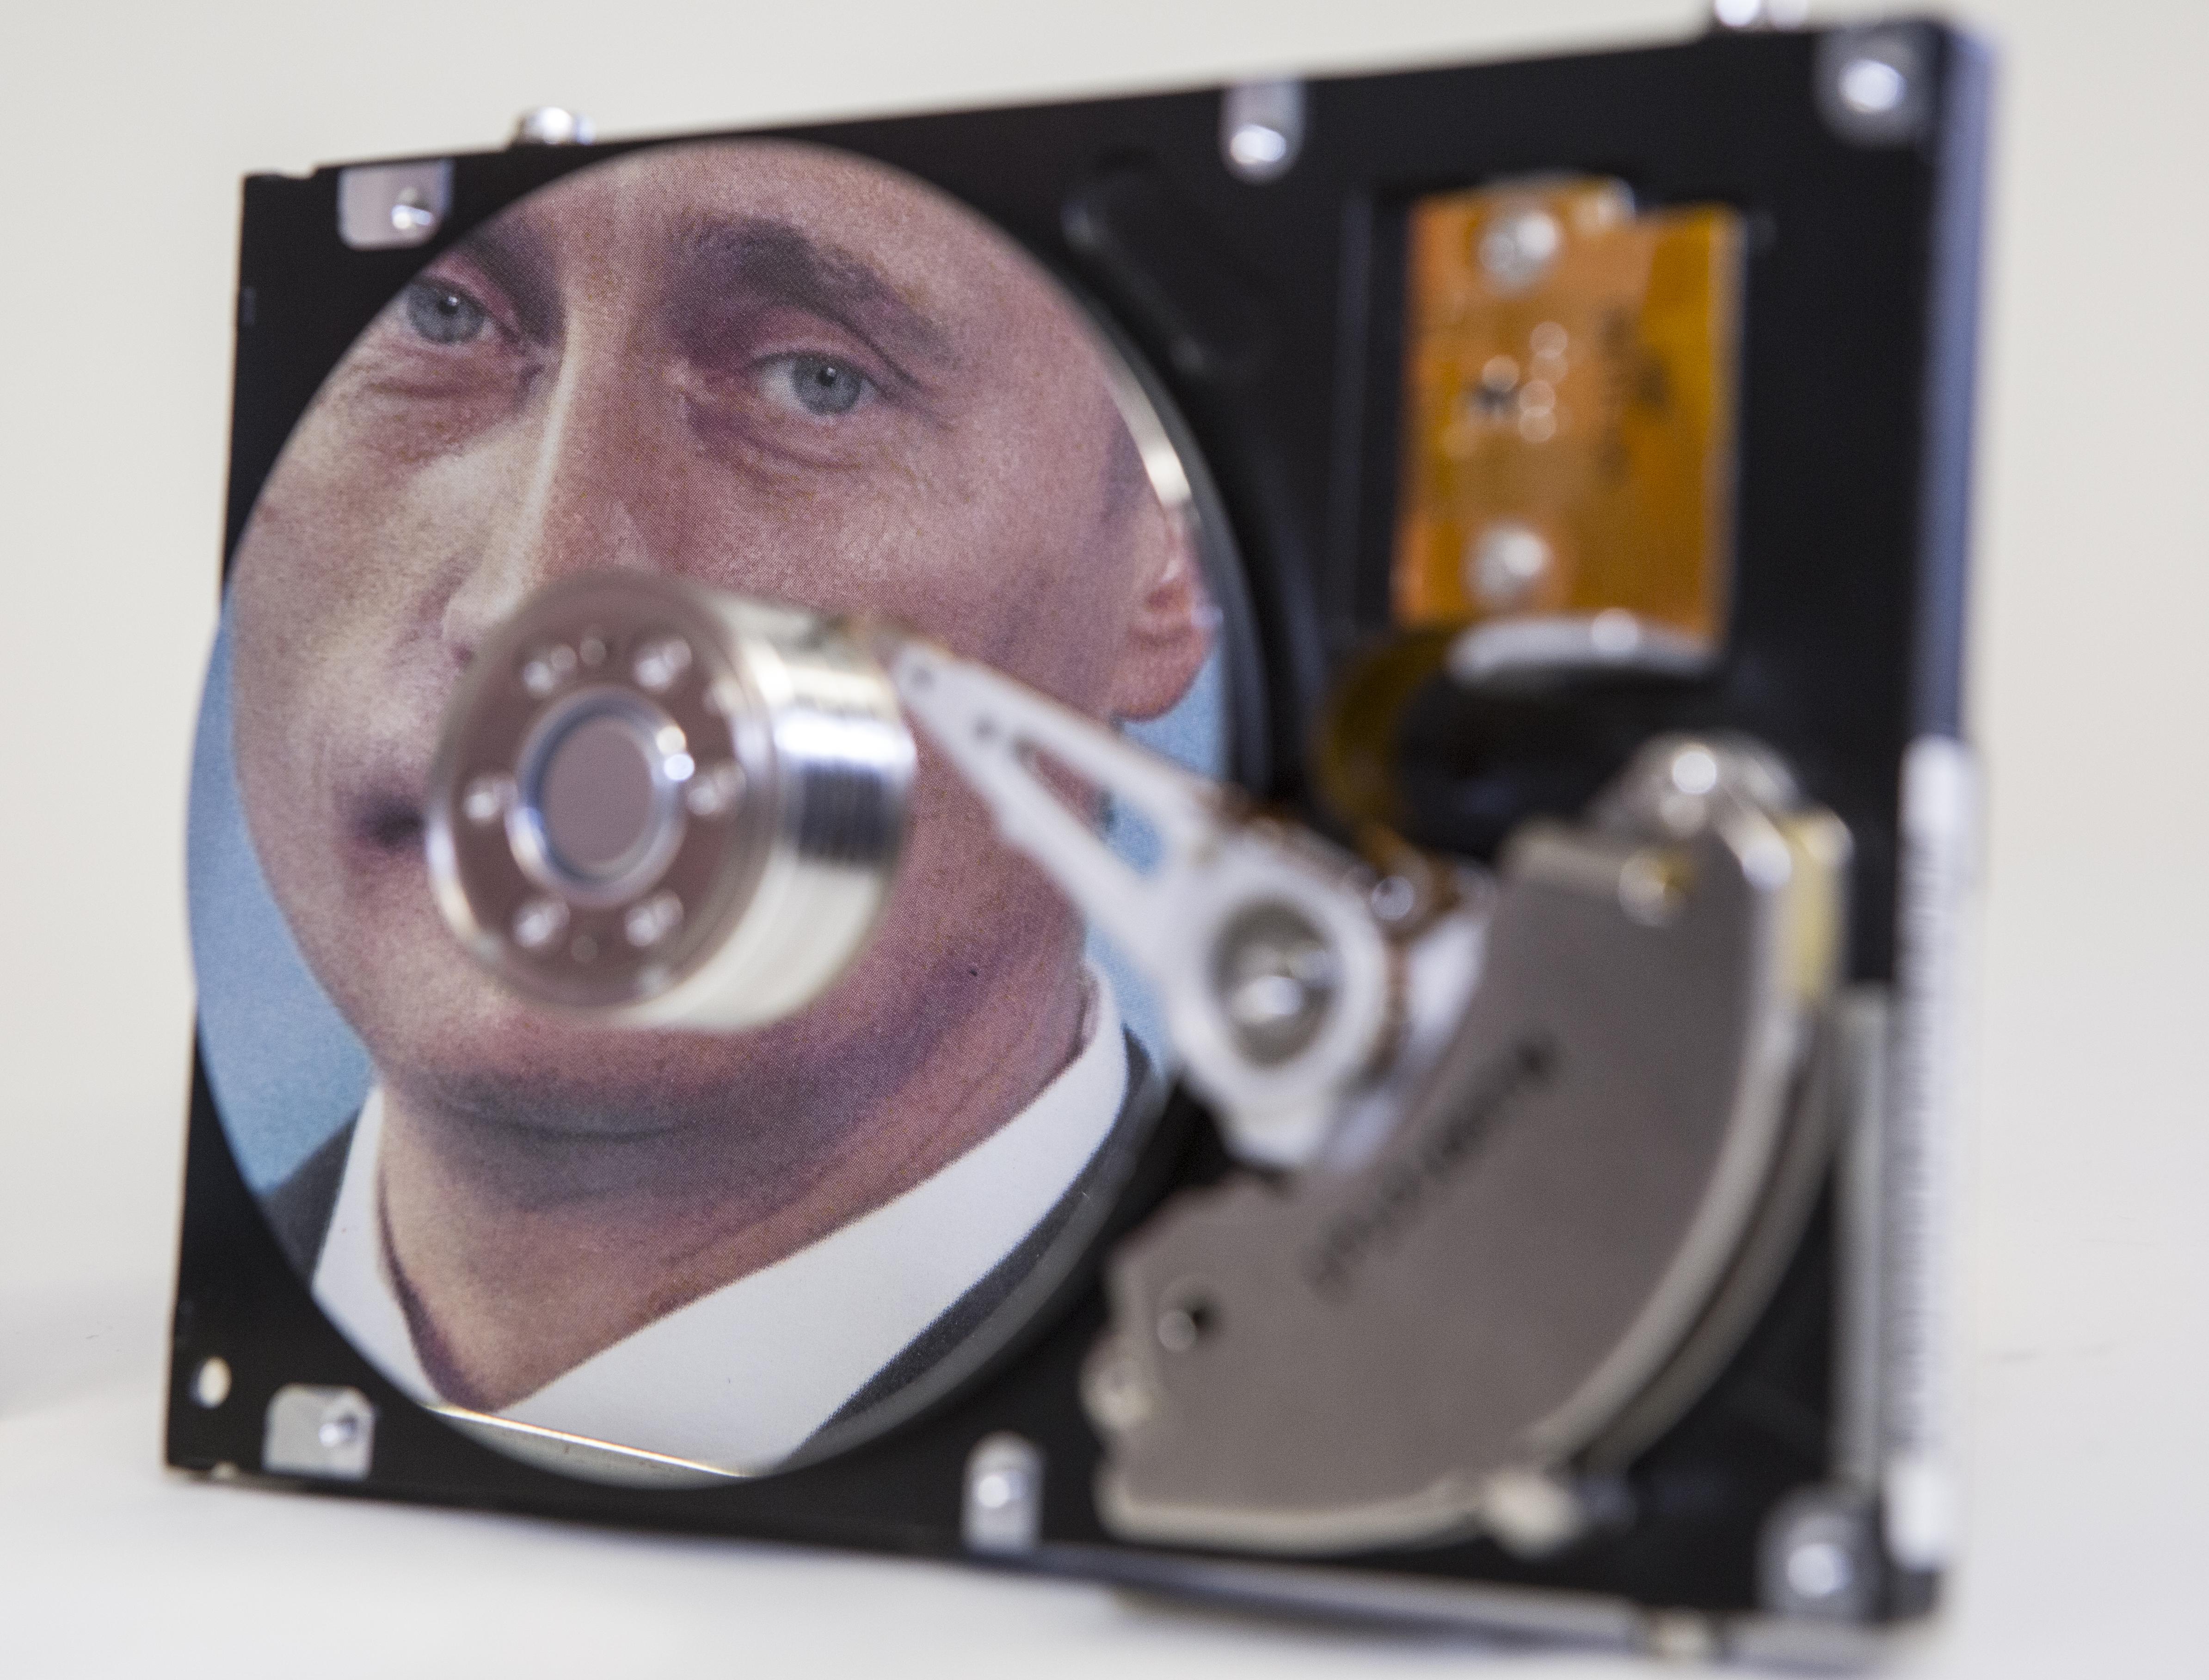 Putin-portrait reflected in a computer hard-drive.